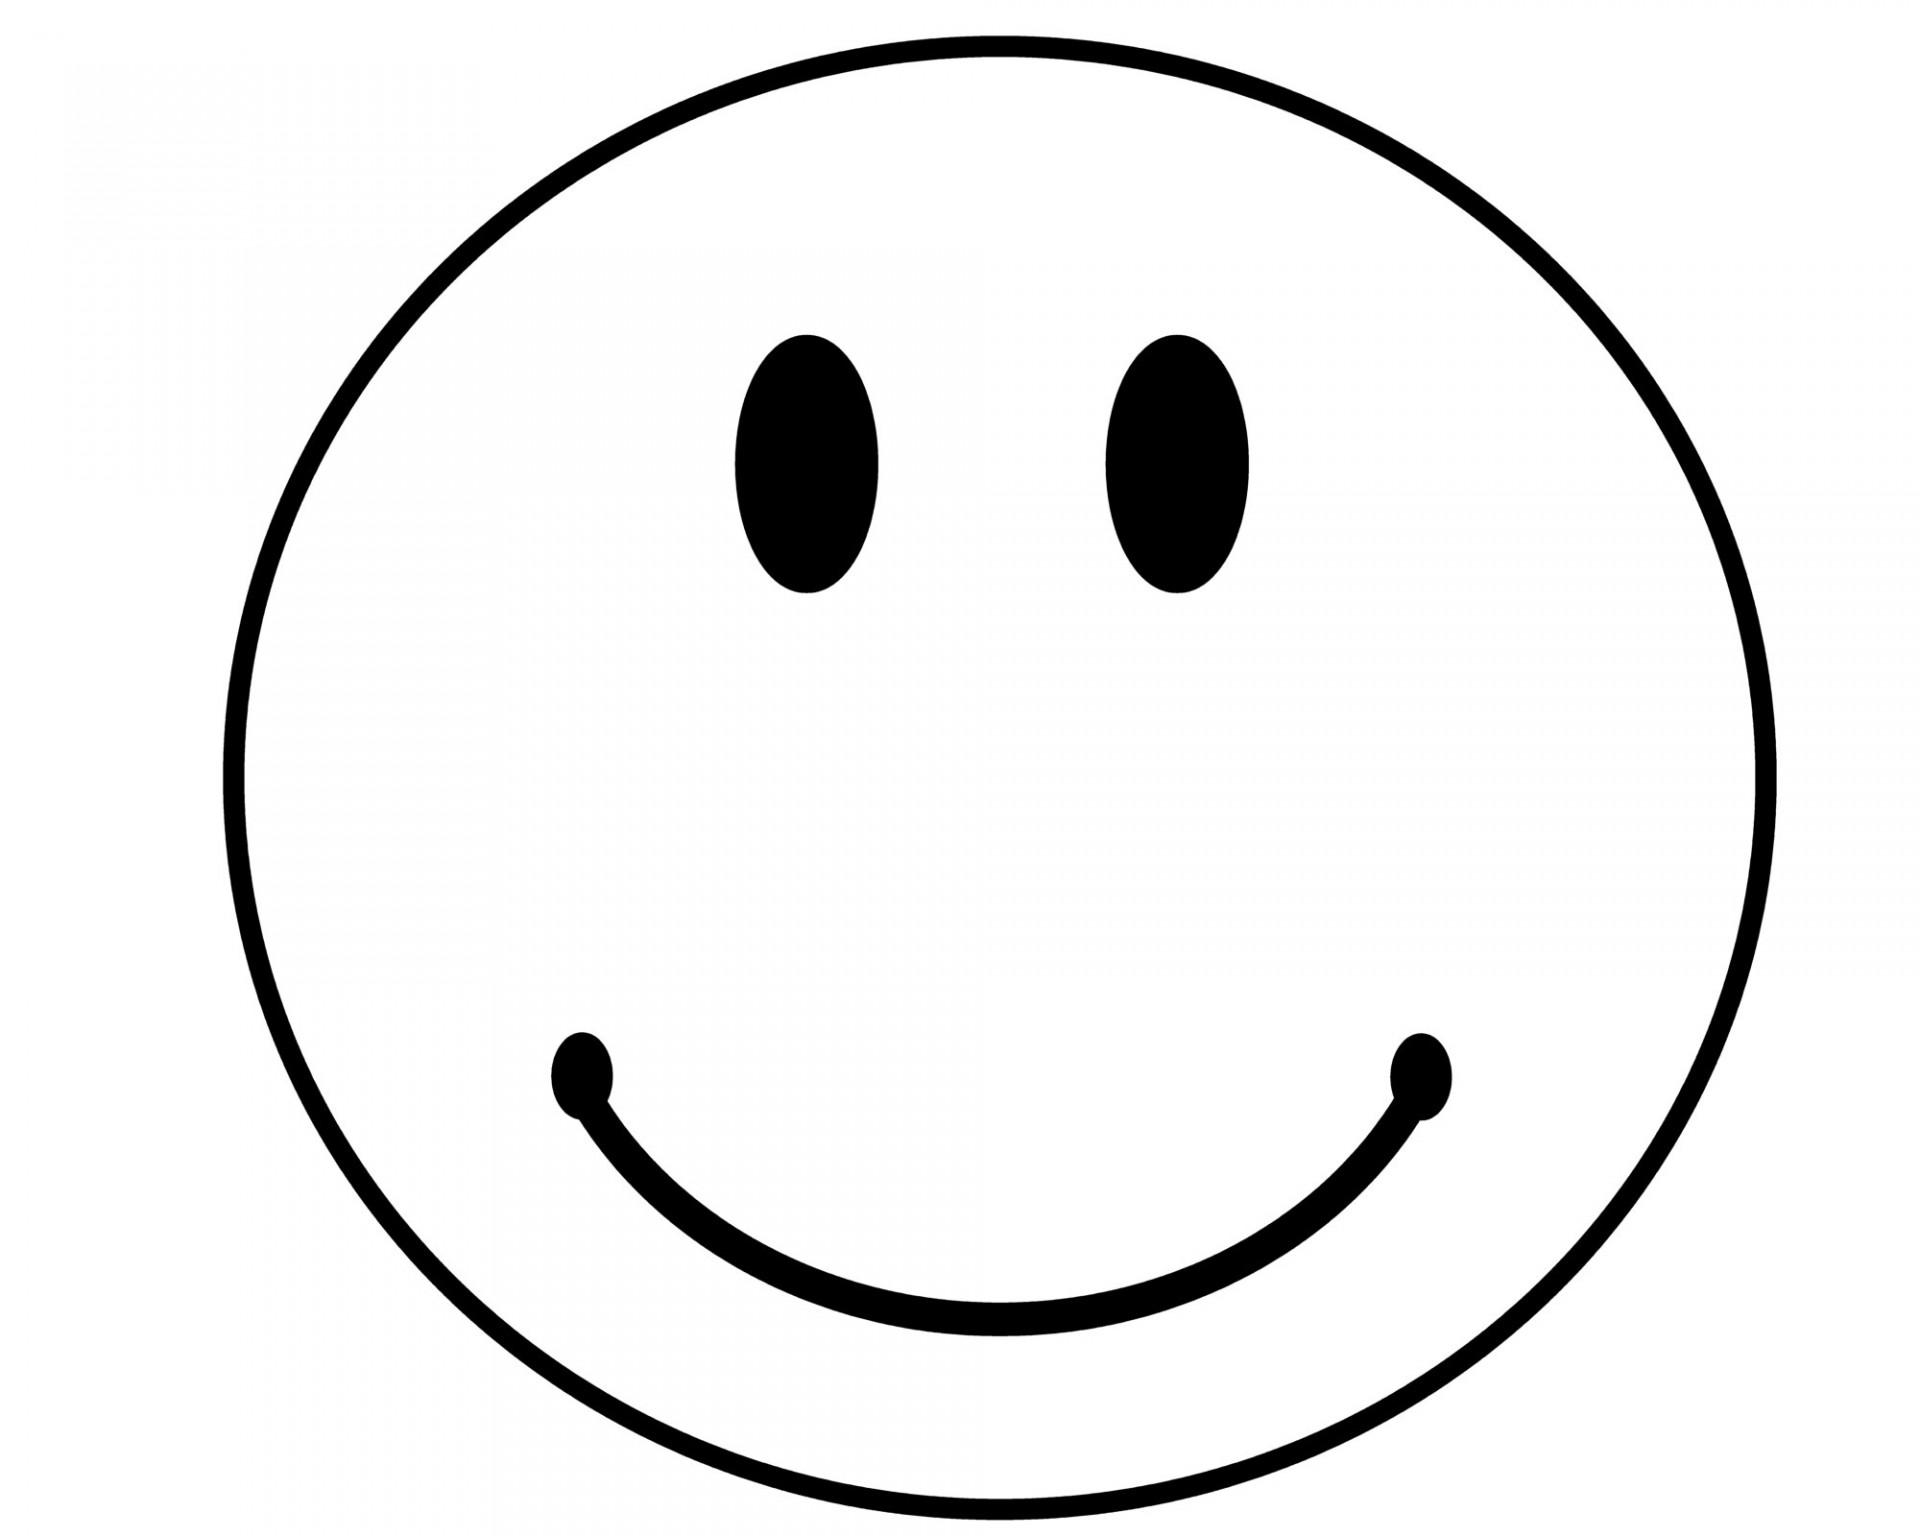 Clip Art Smiley Face Free Stock Photo - Public Domain Pictures